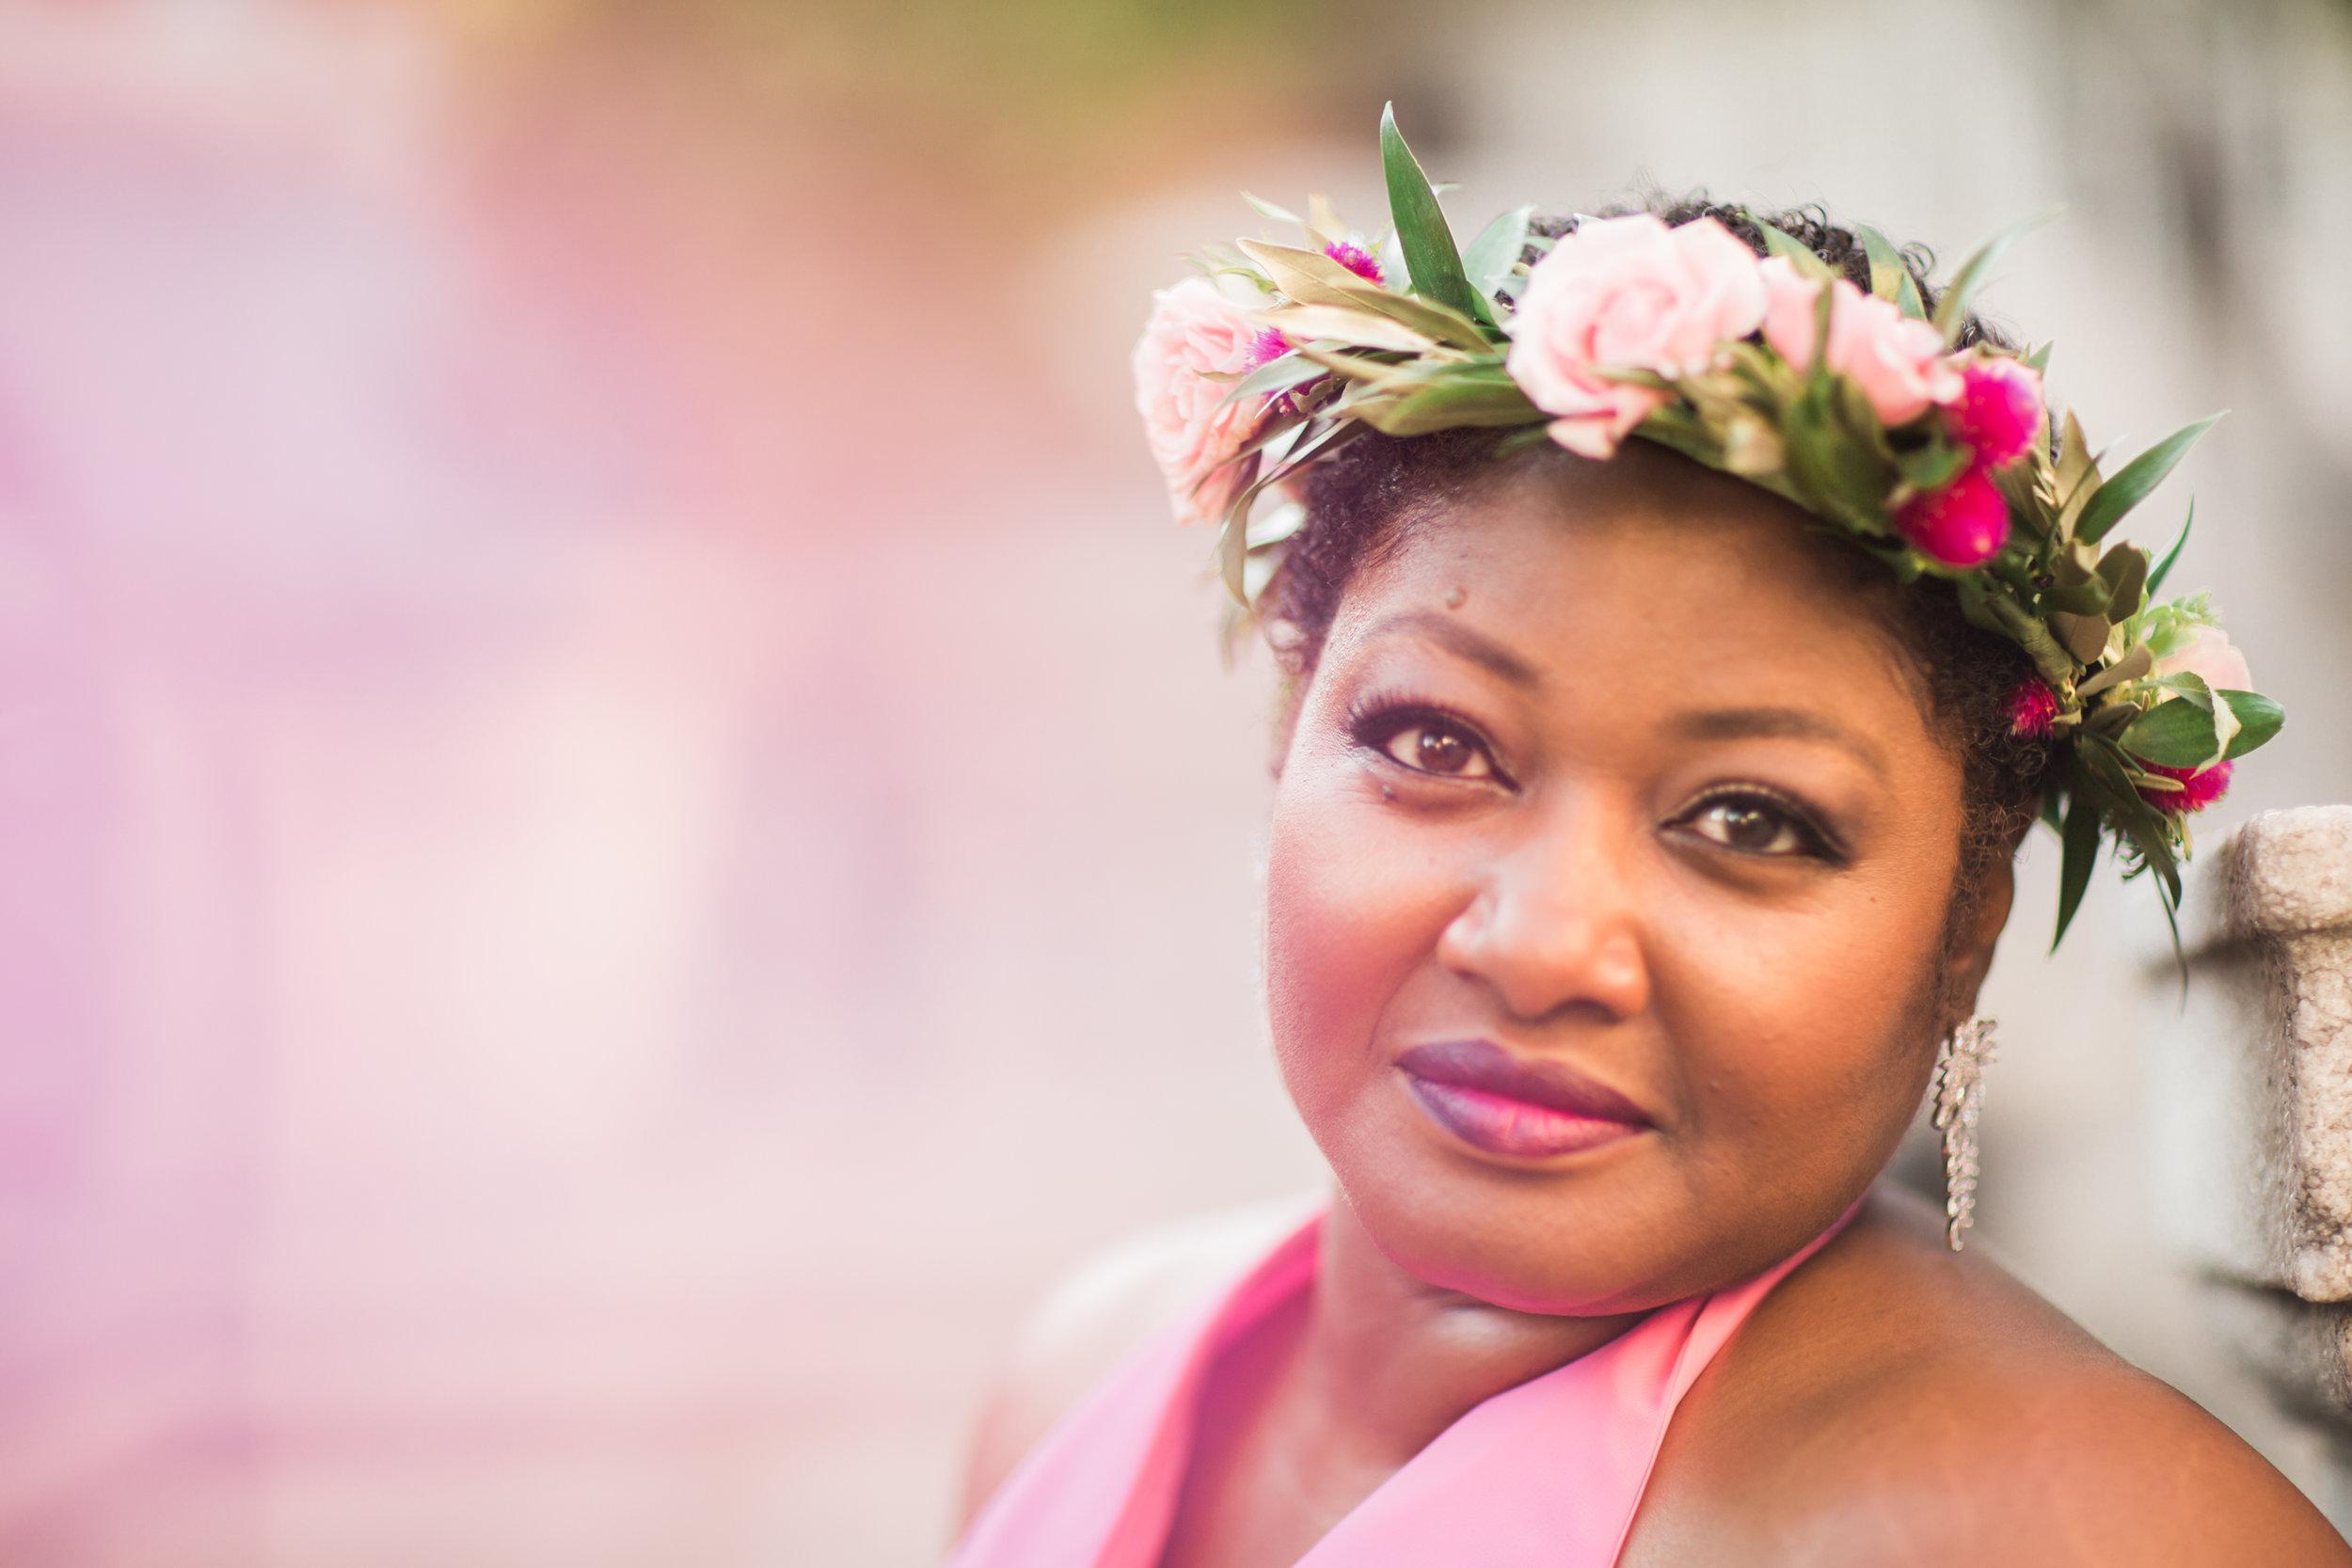 Mount Vernon Baltimore Breast Cancer Photoshoot Megapixels Media